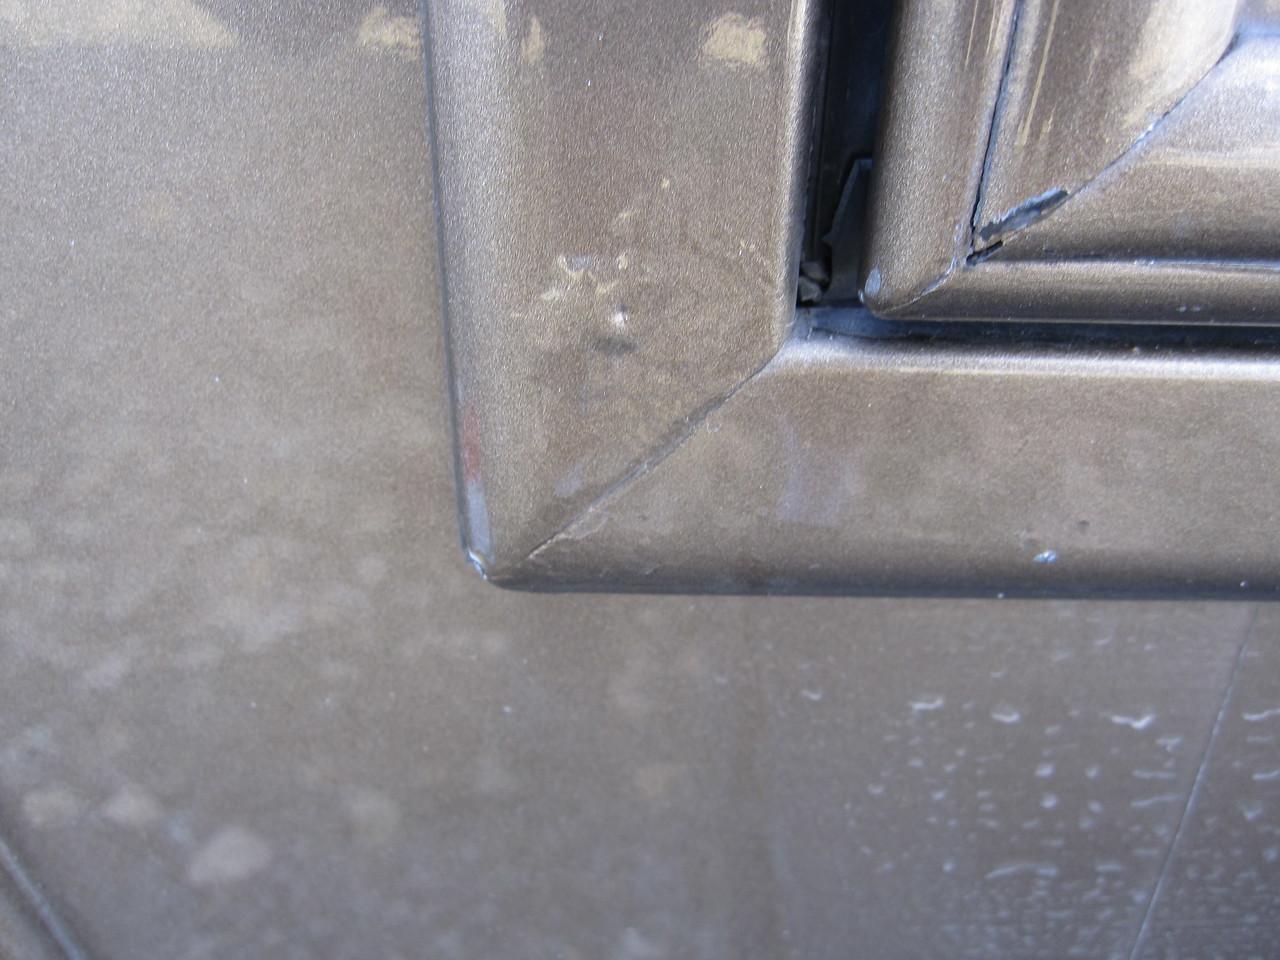 Paint blistering primarily on aluminum trim surfaces.